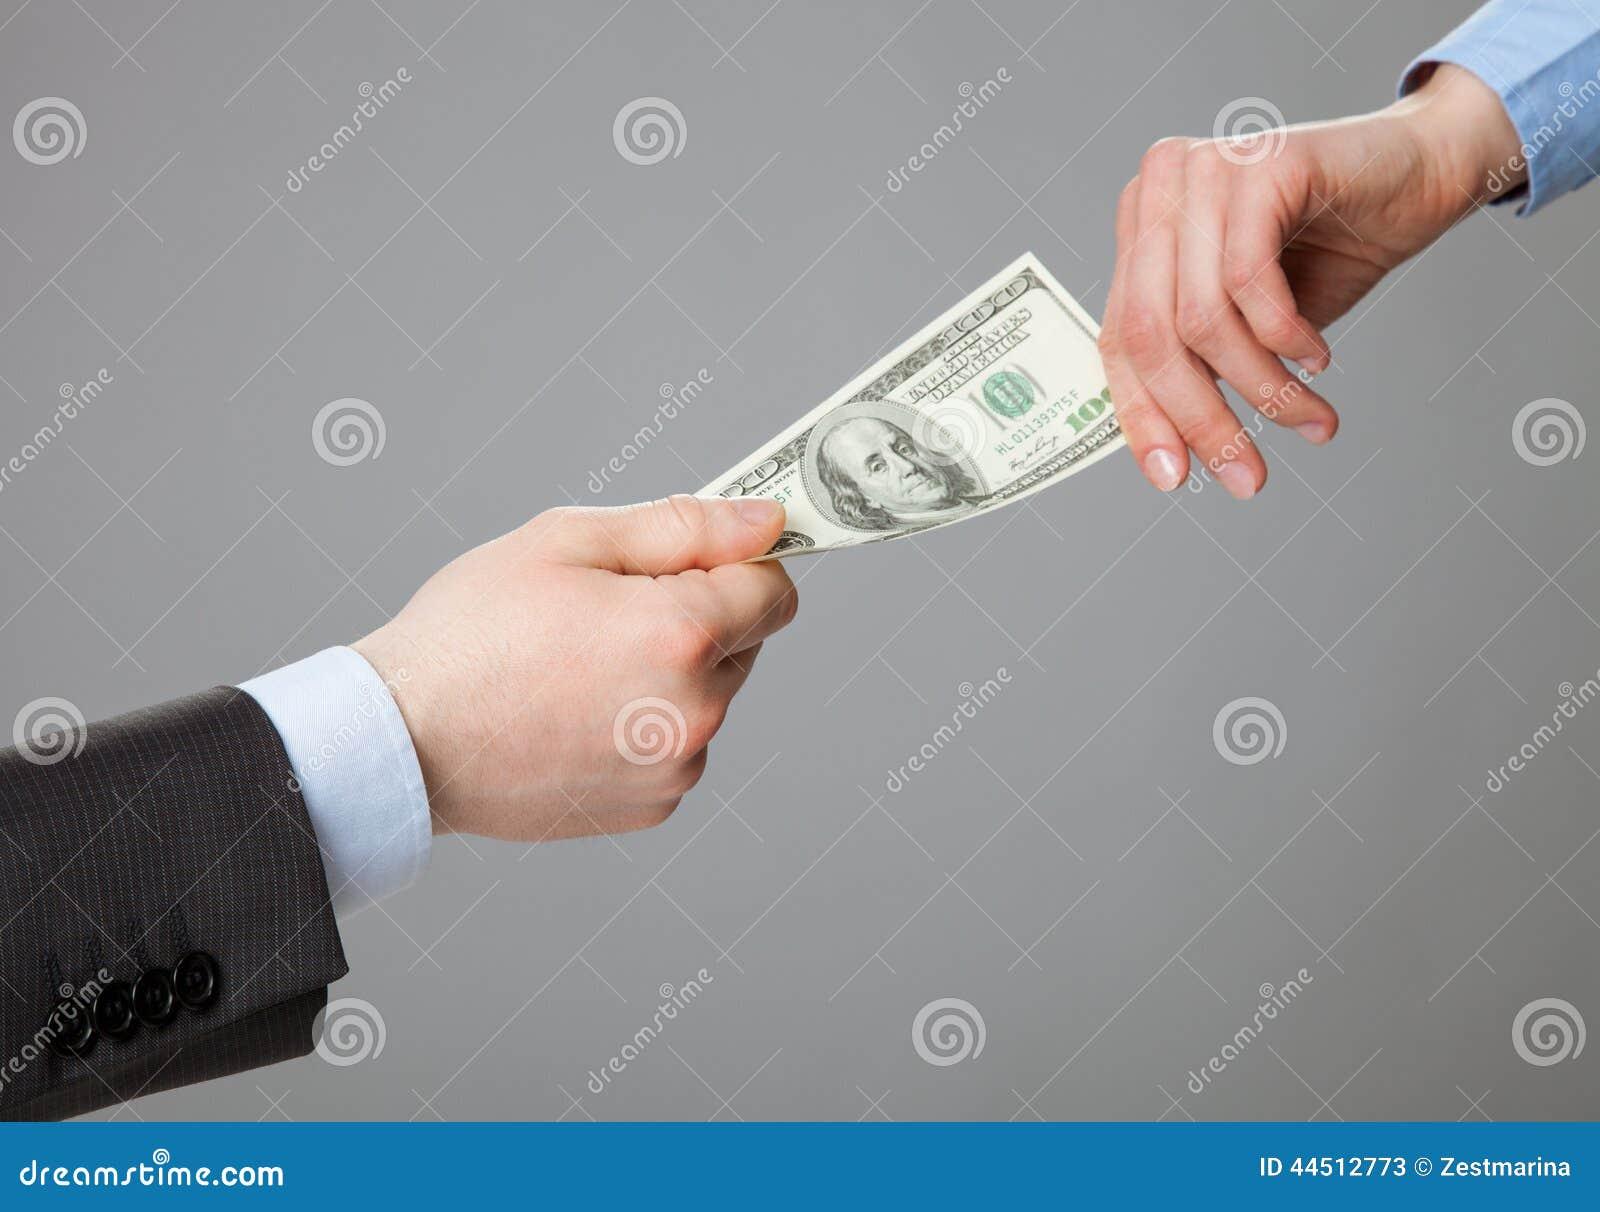 Business people hands exchanging money